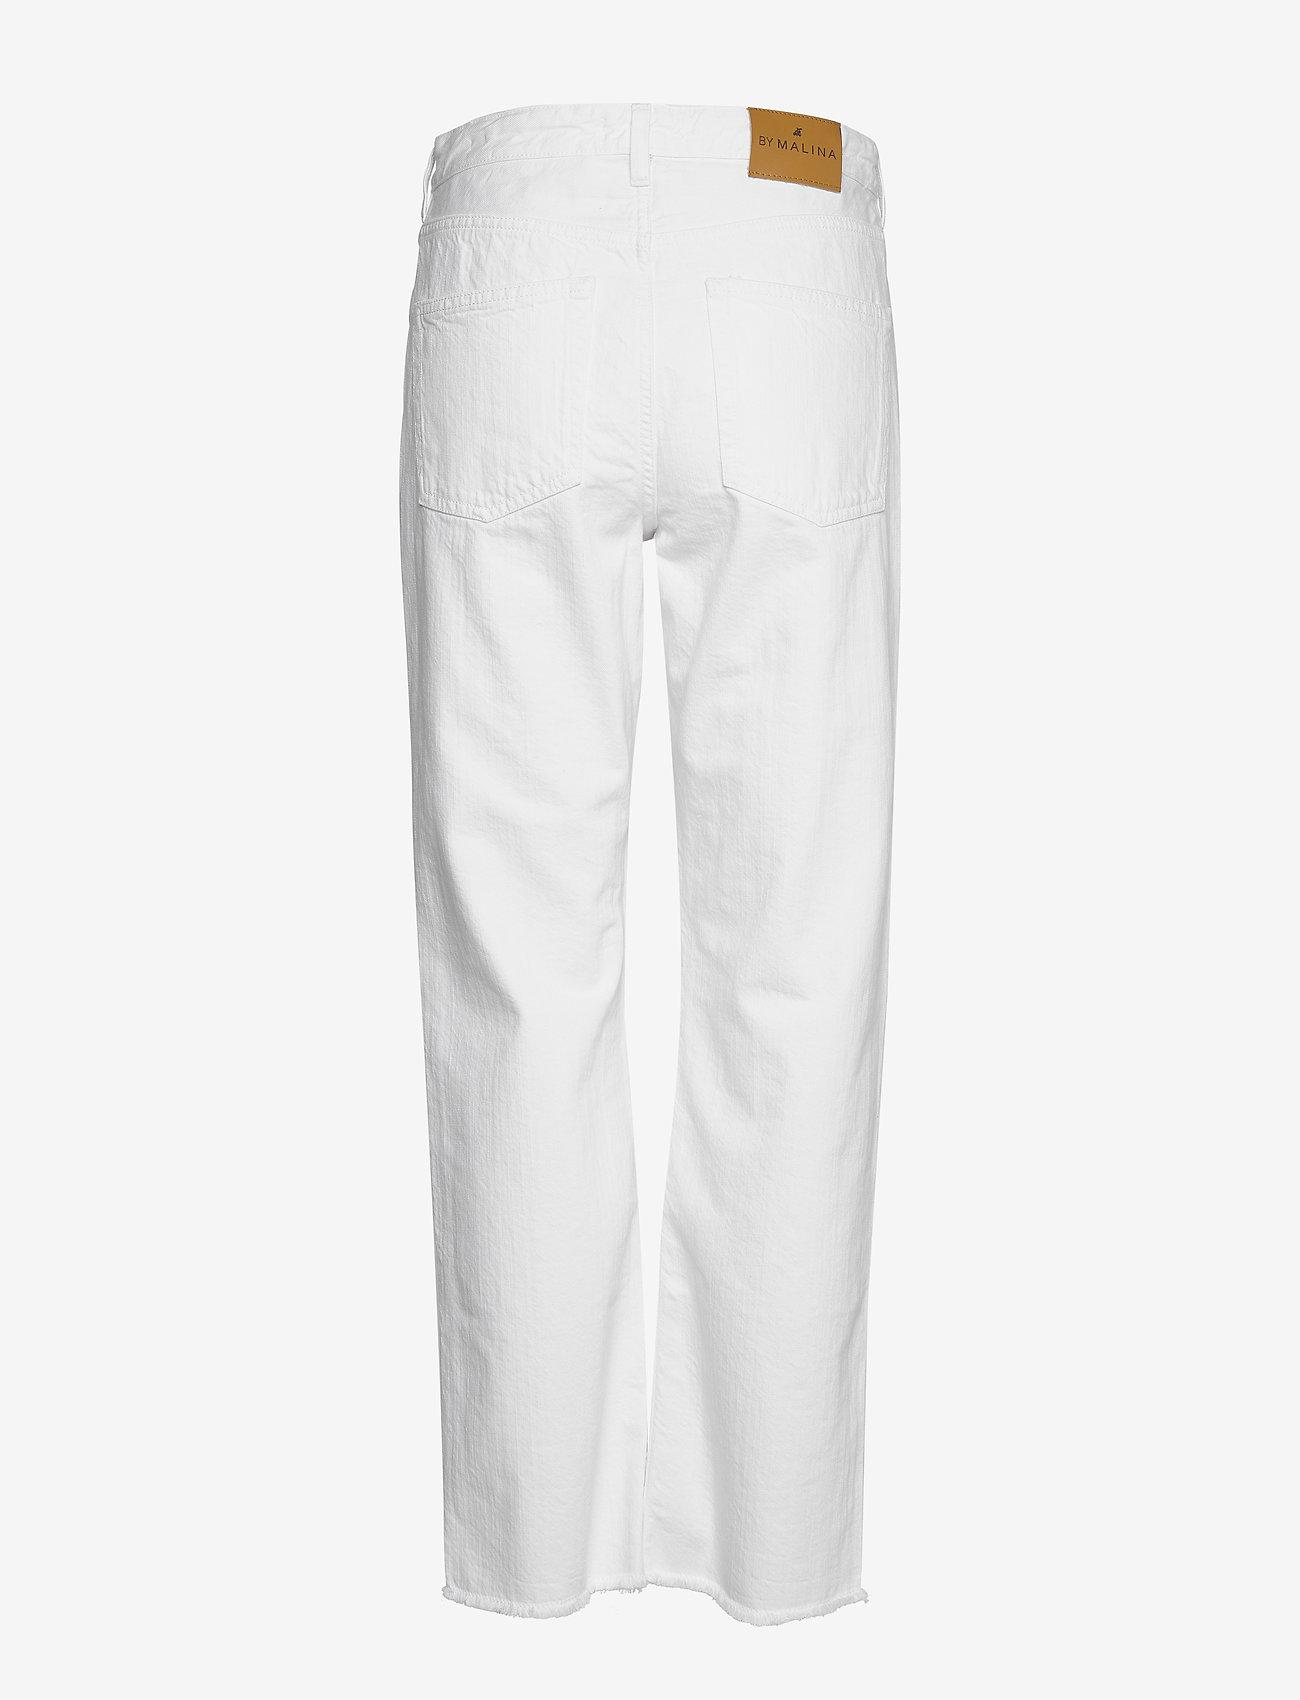 By Malina - Alexa jeans - straight regular - white - 1